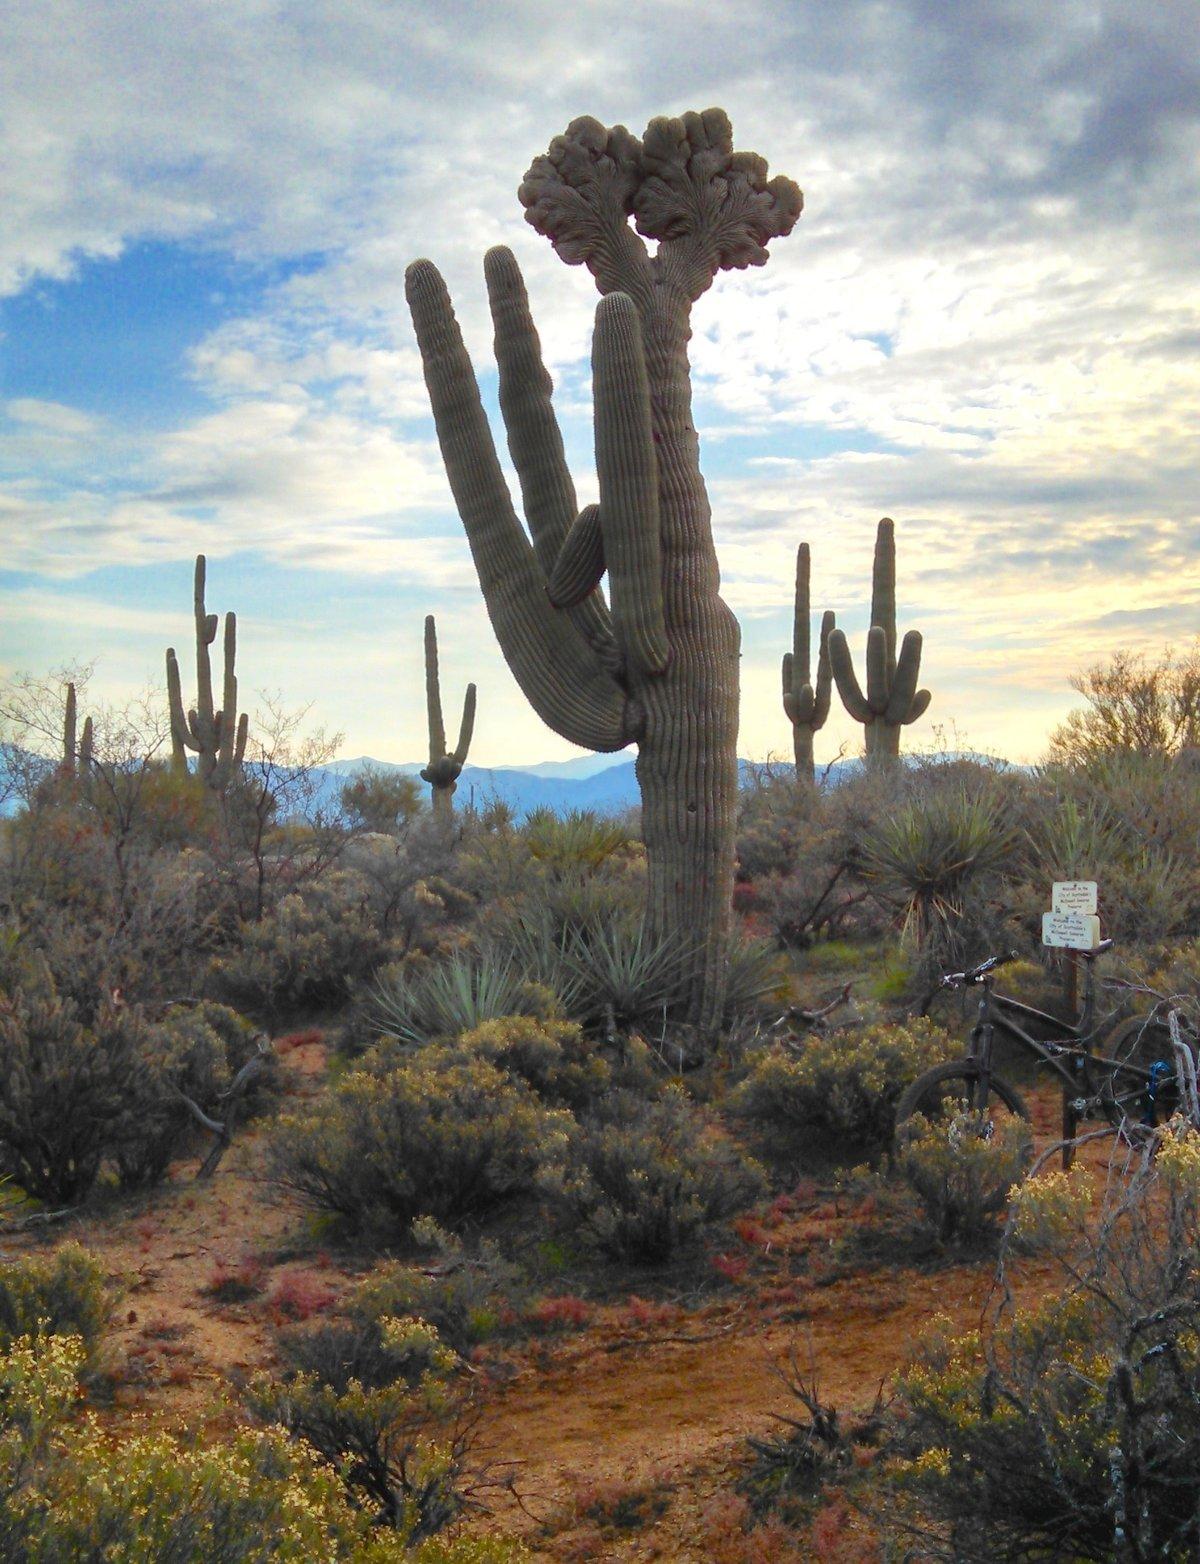 Arizona desert cactus pictures Arizona Sunsets Arizona Sunset Pictures